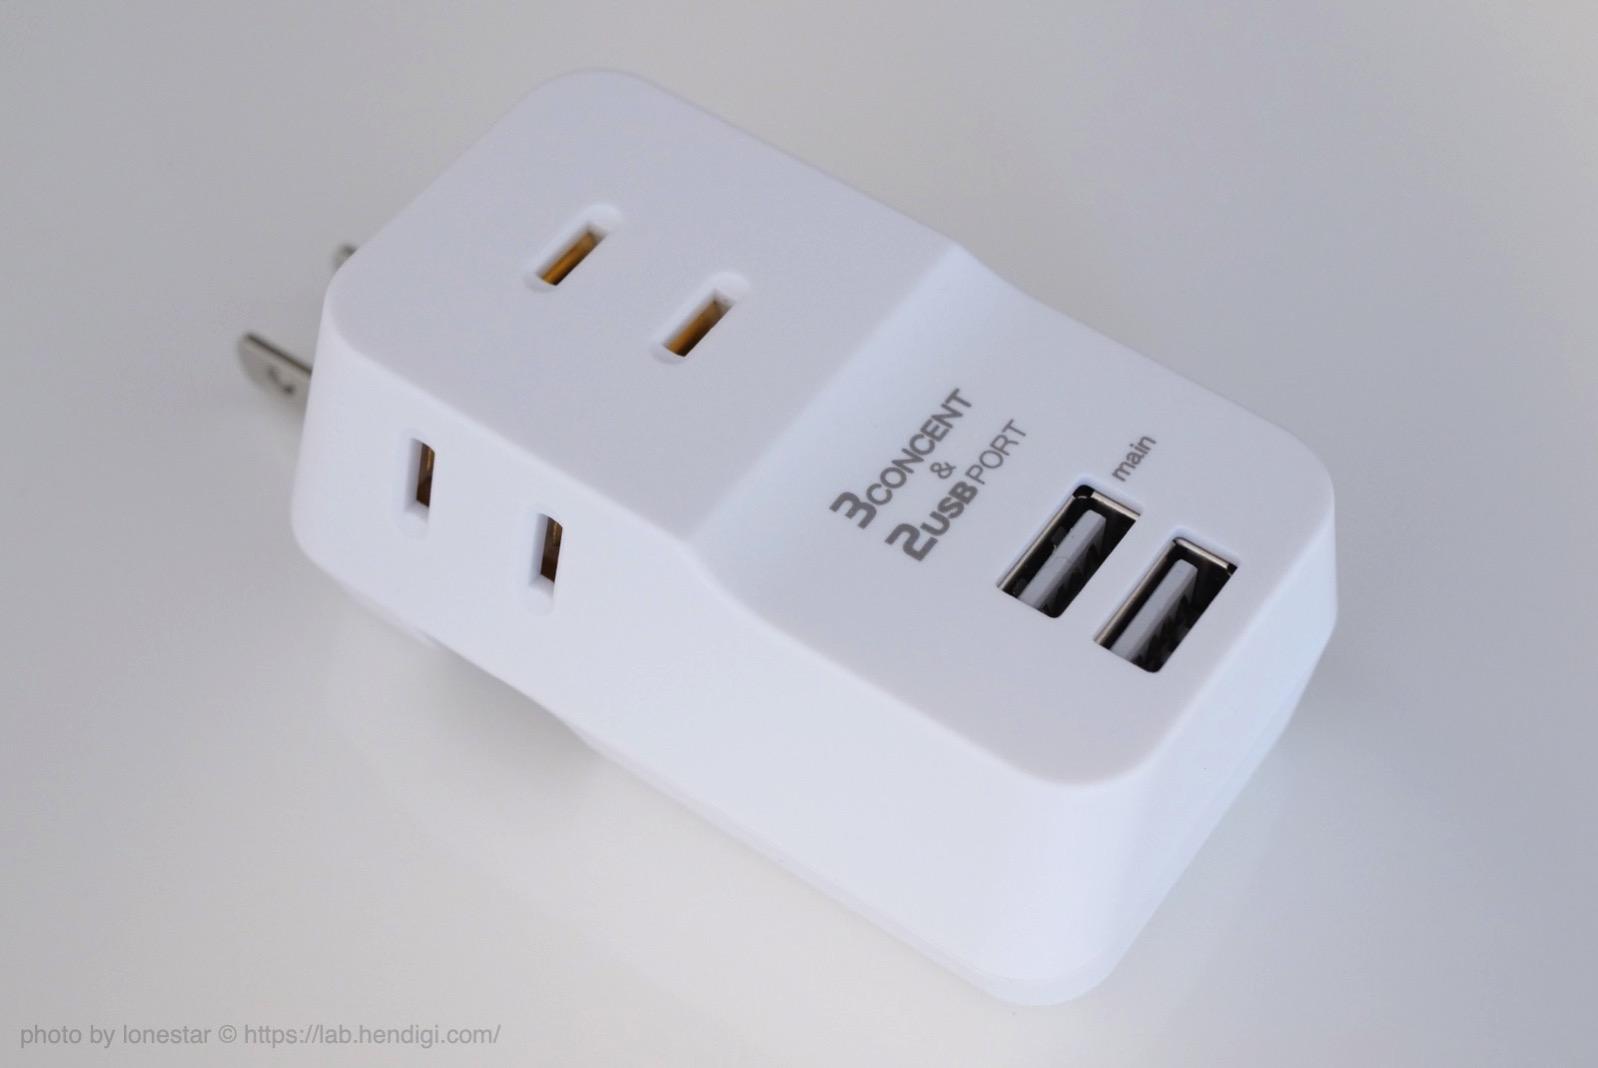 USBポート付き電源タップ レビュー